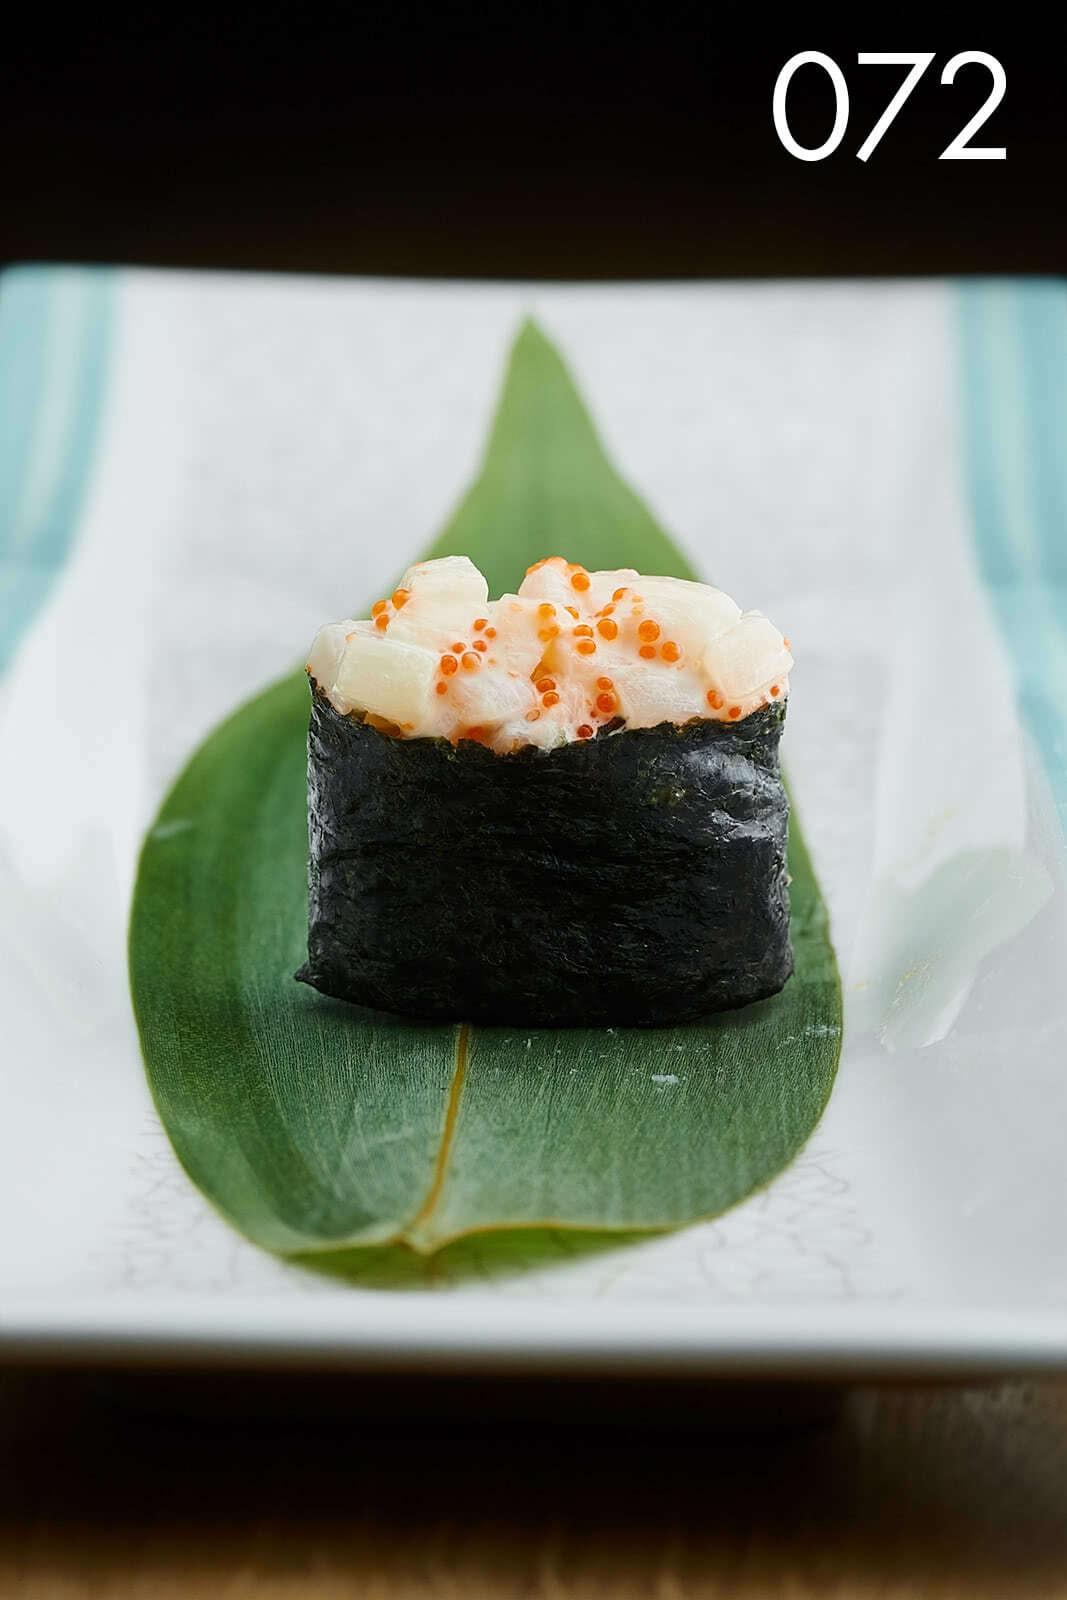 суши феликс с гребешком в ресторане Веранда